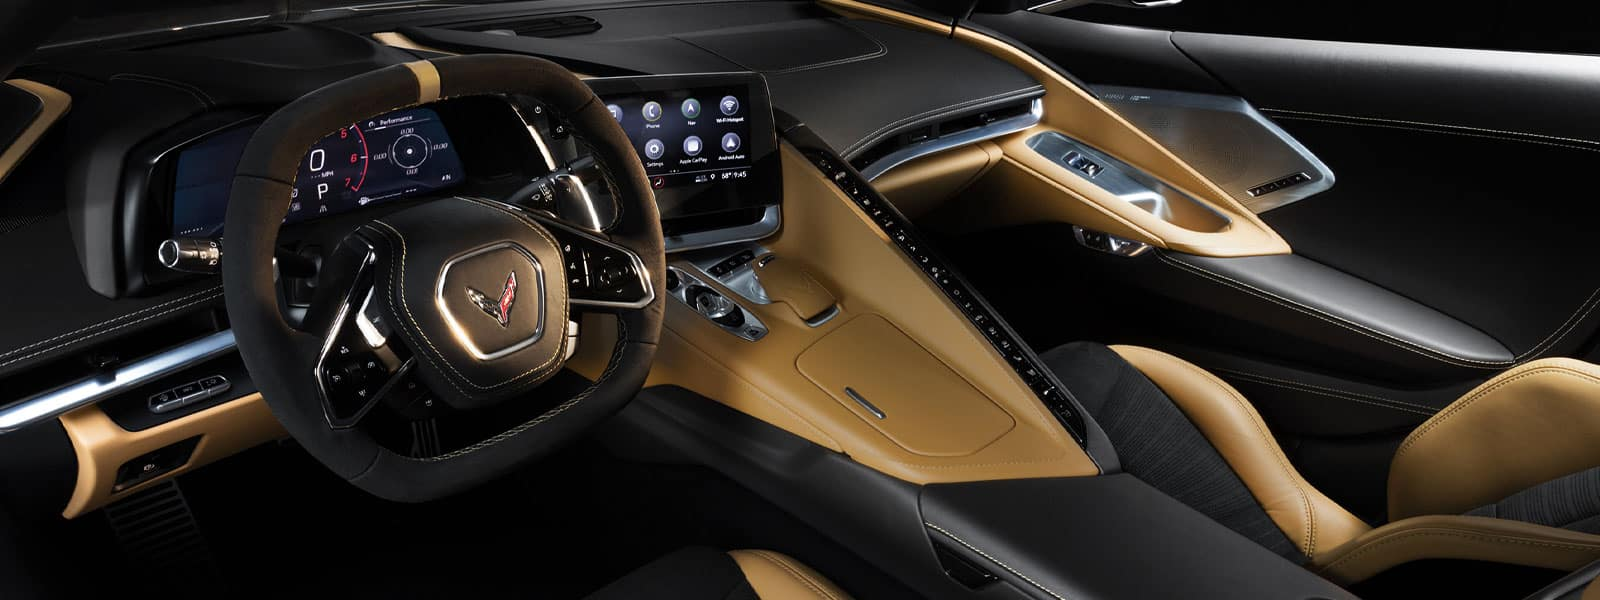 Custom Order new 2022 Chevrolet Corvette in Sudbury Ontario